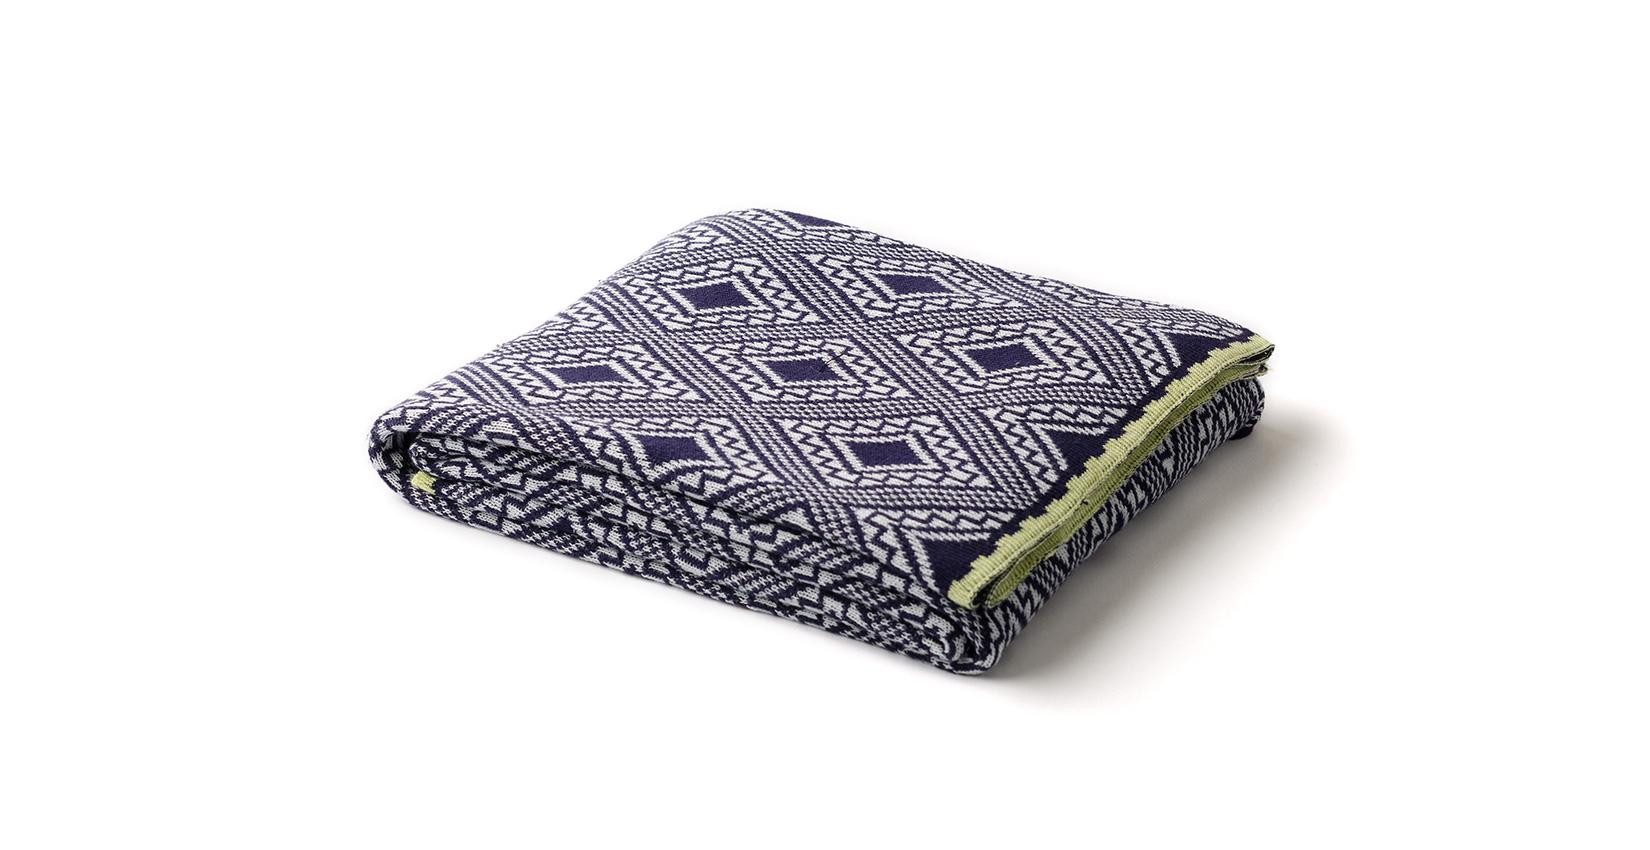 knitted, malhas – Knit jacquard